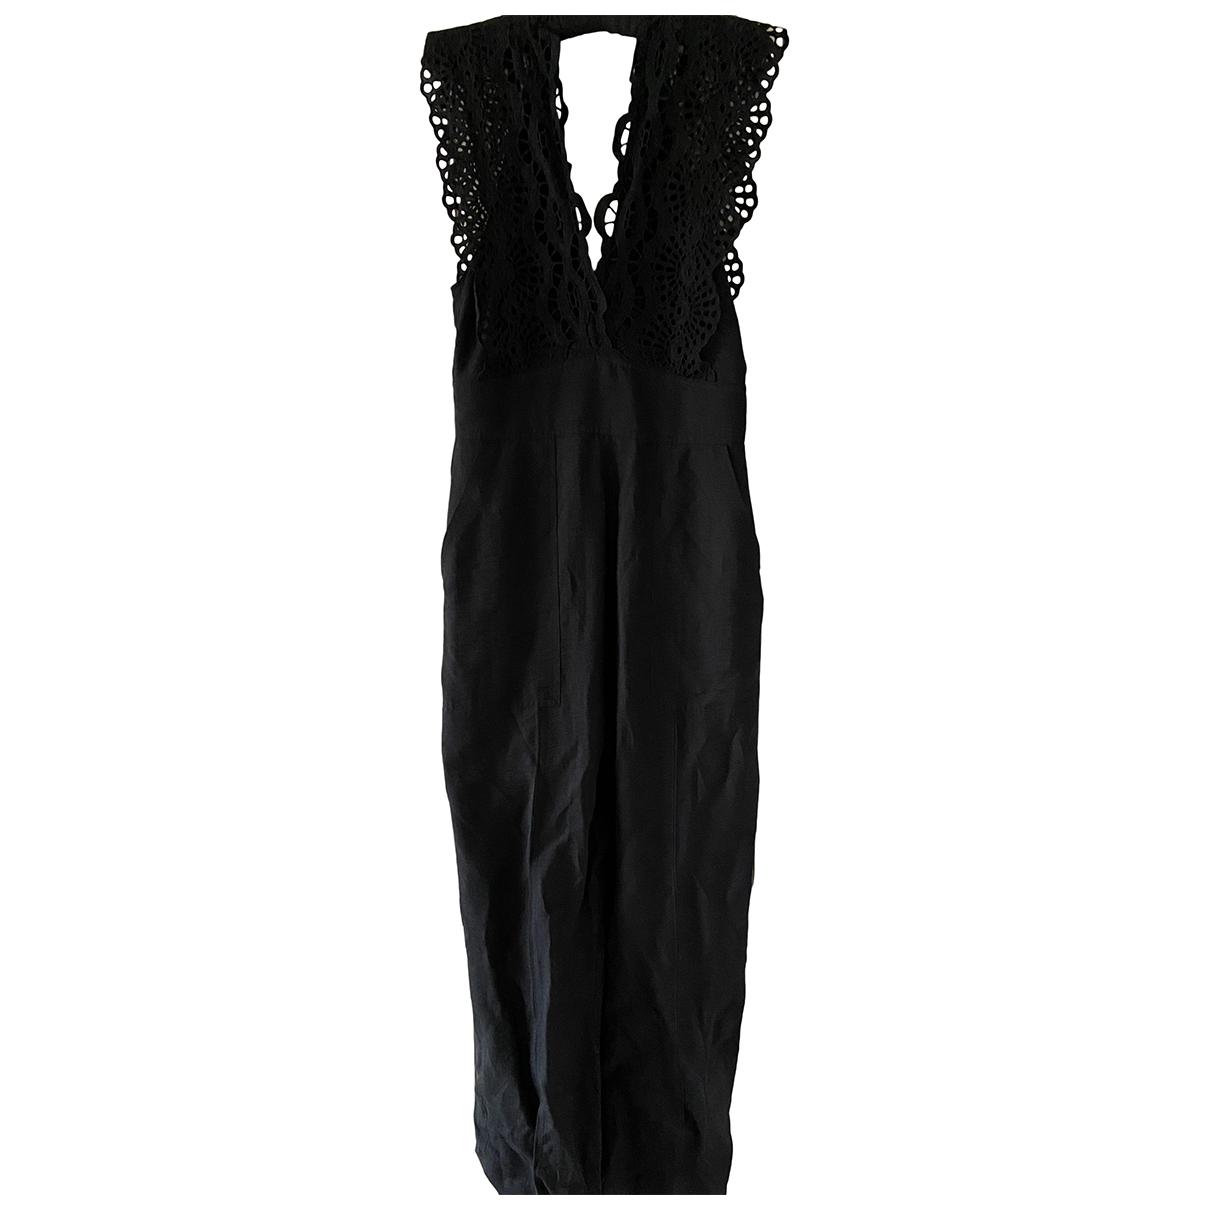 Sandro - Combinaison Spring Summer 2020 pour femme en lin - noir